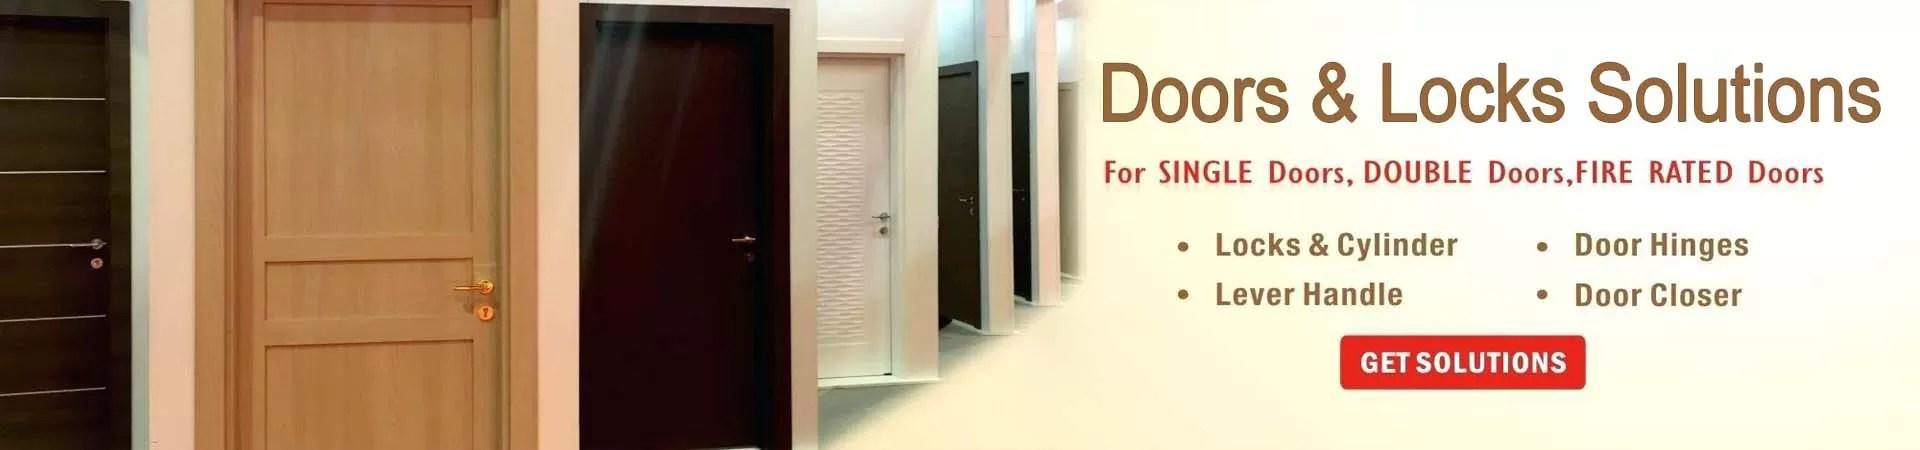 BBG Doors and Locks Solutions